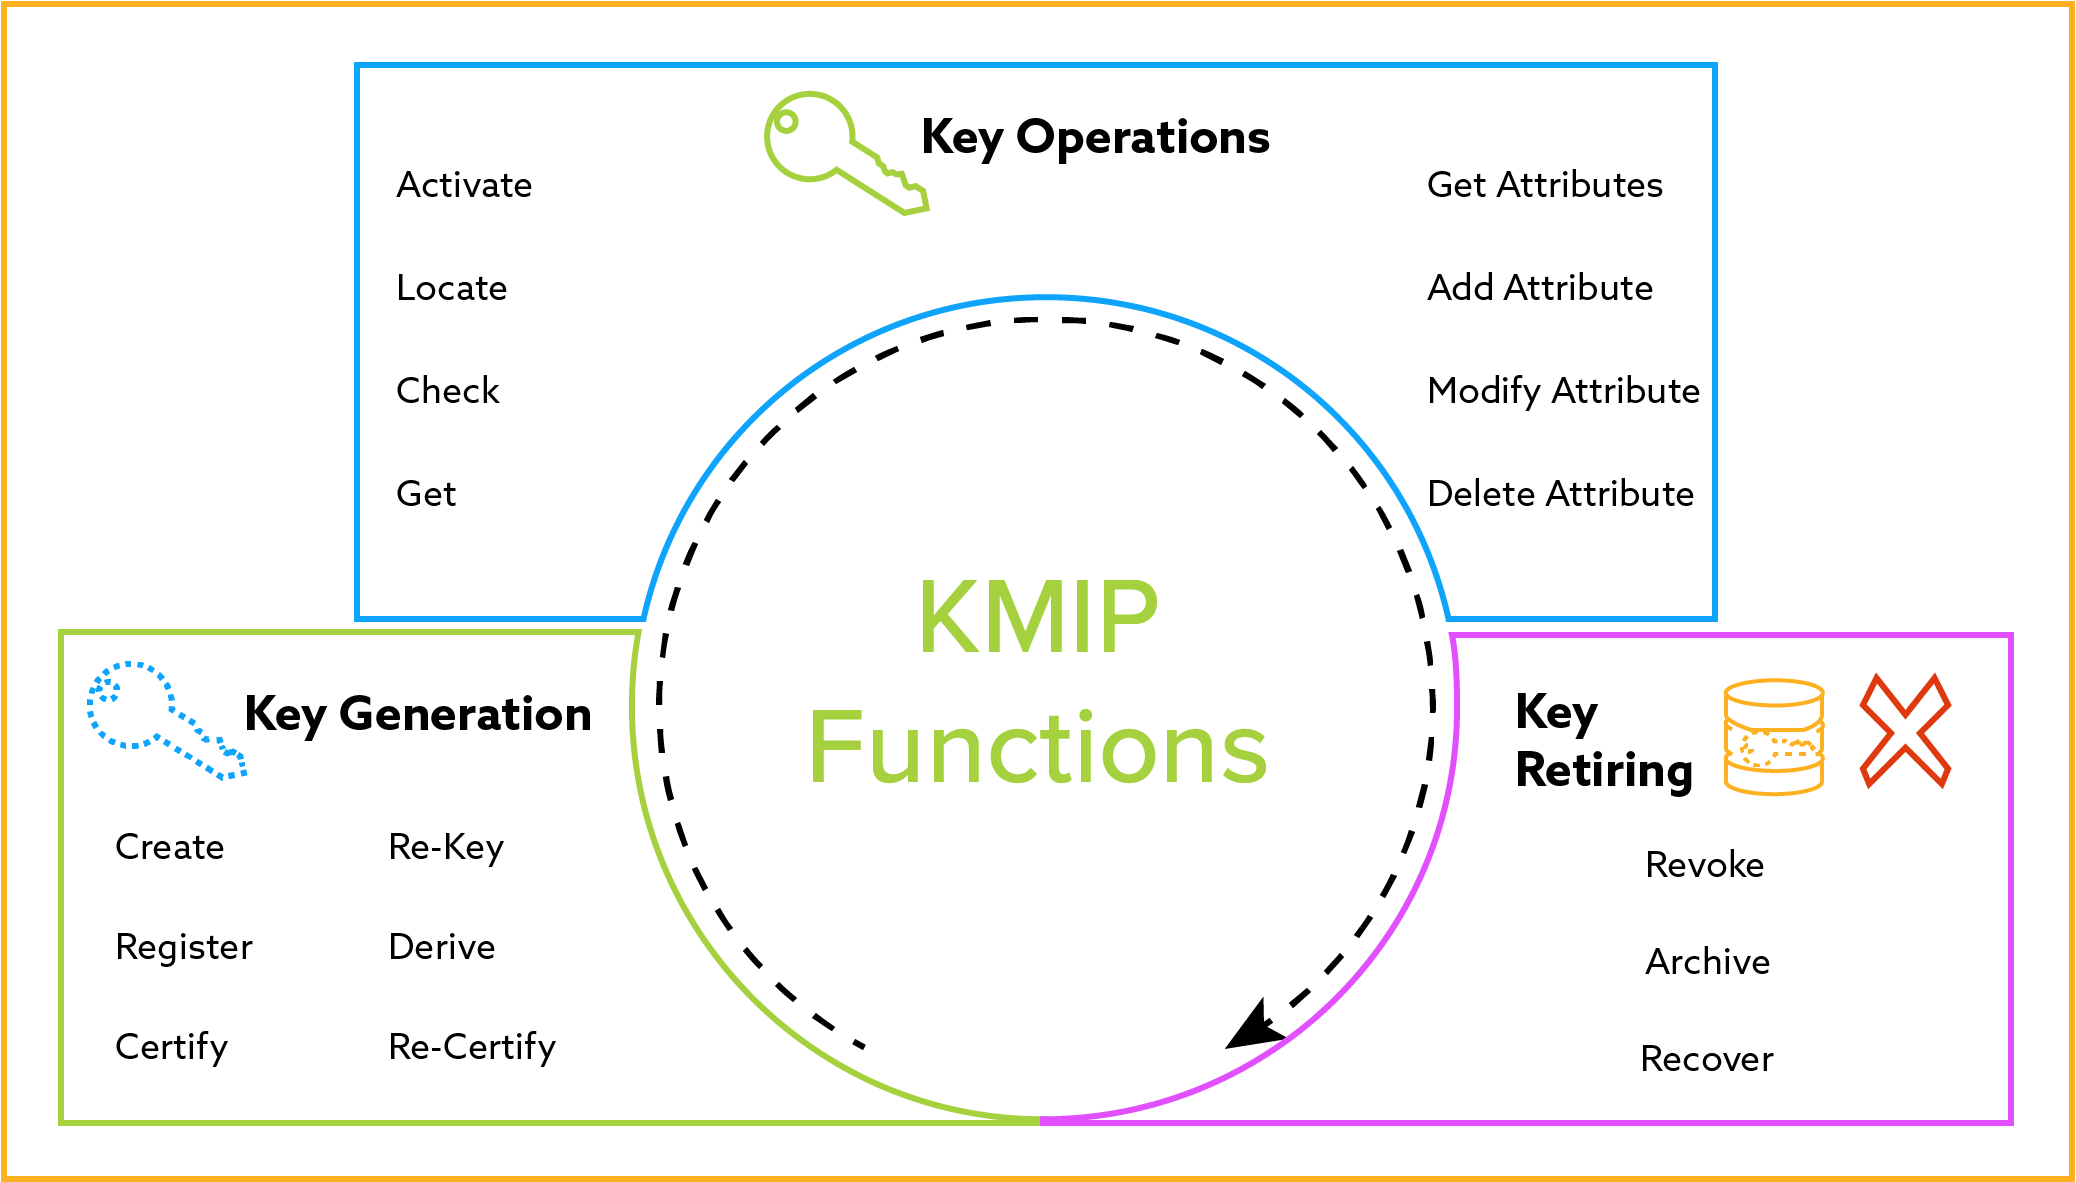 KMIP Functions